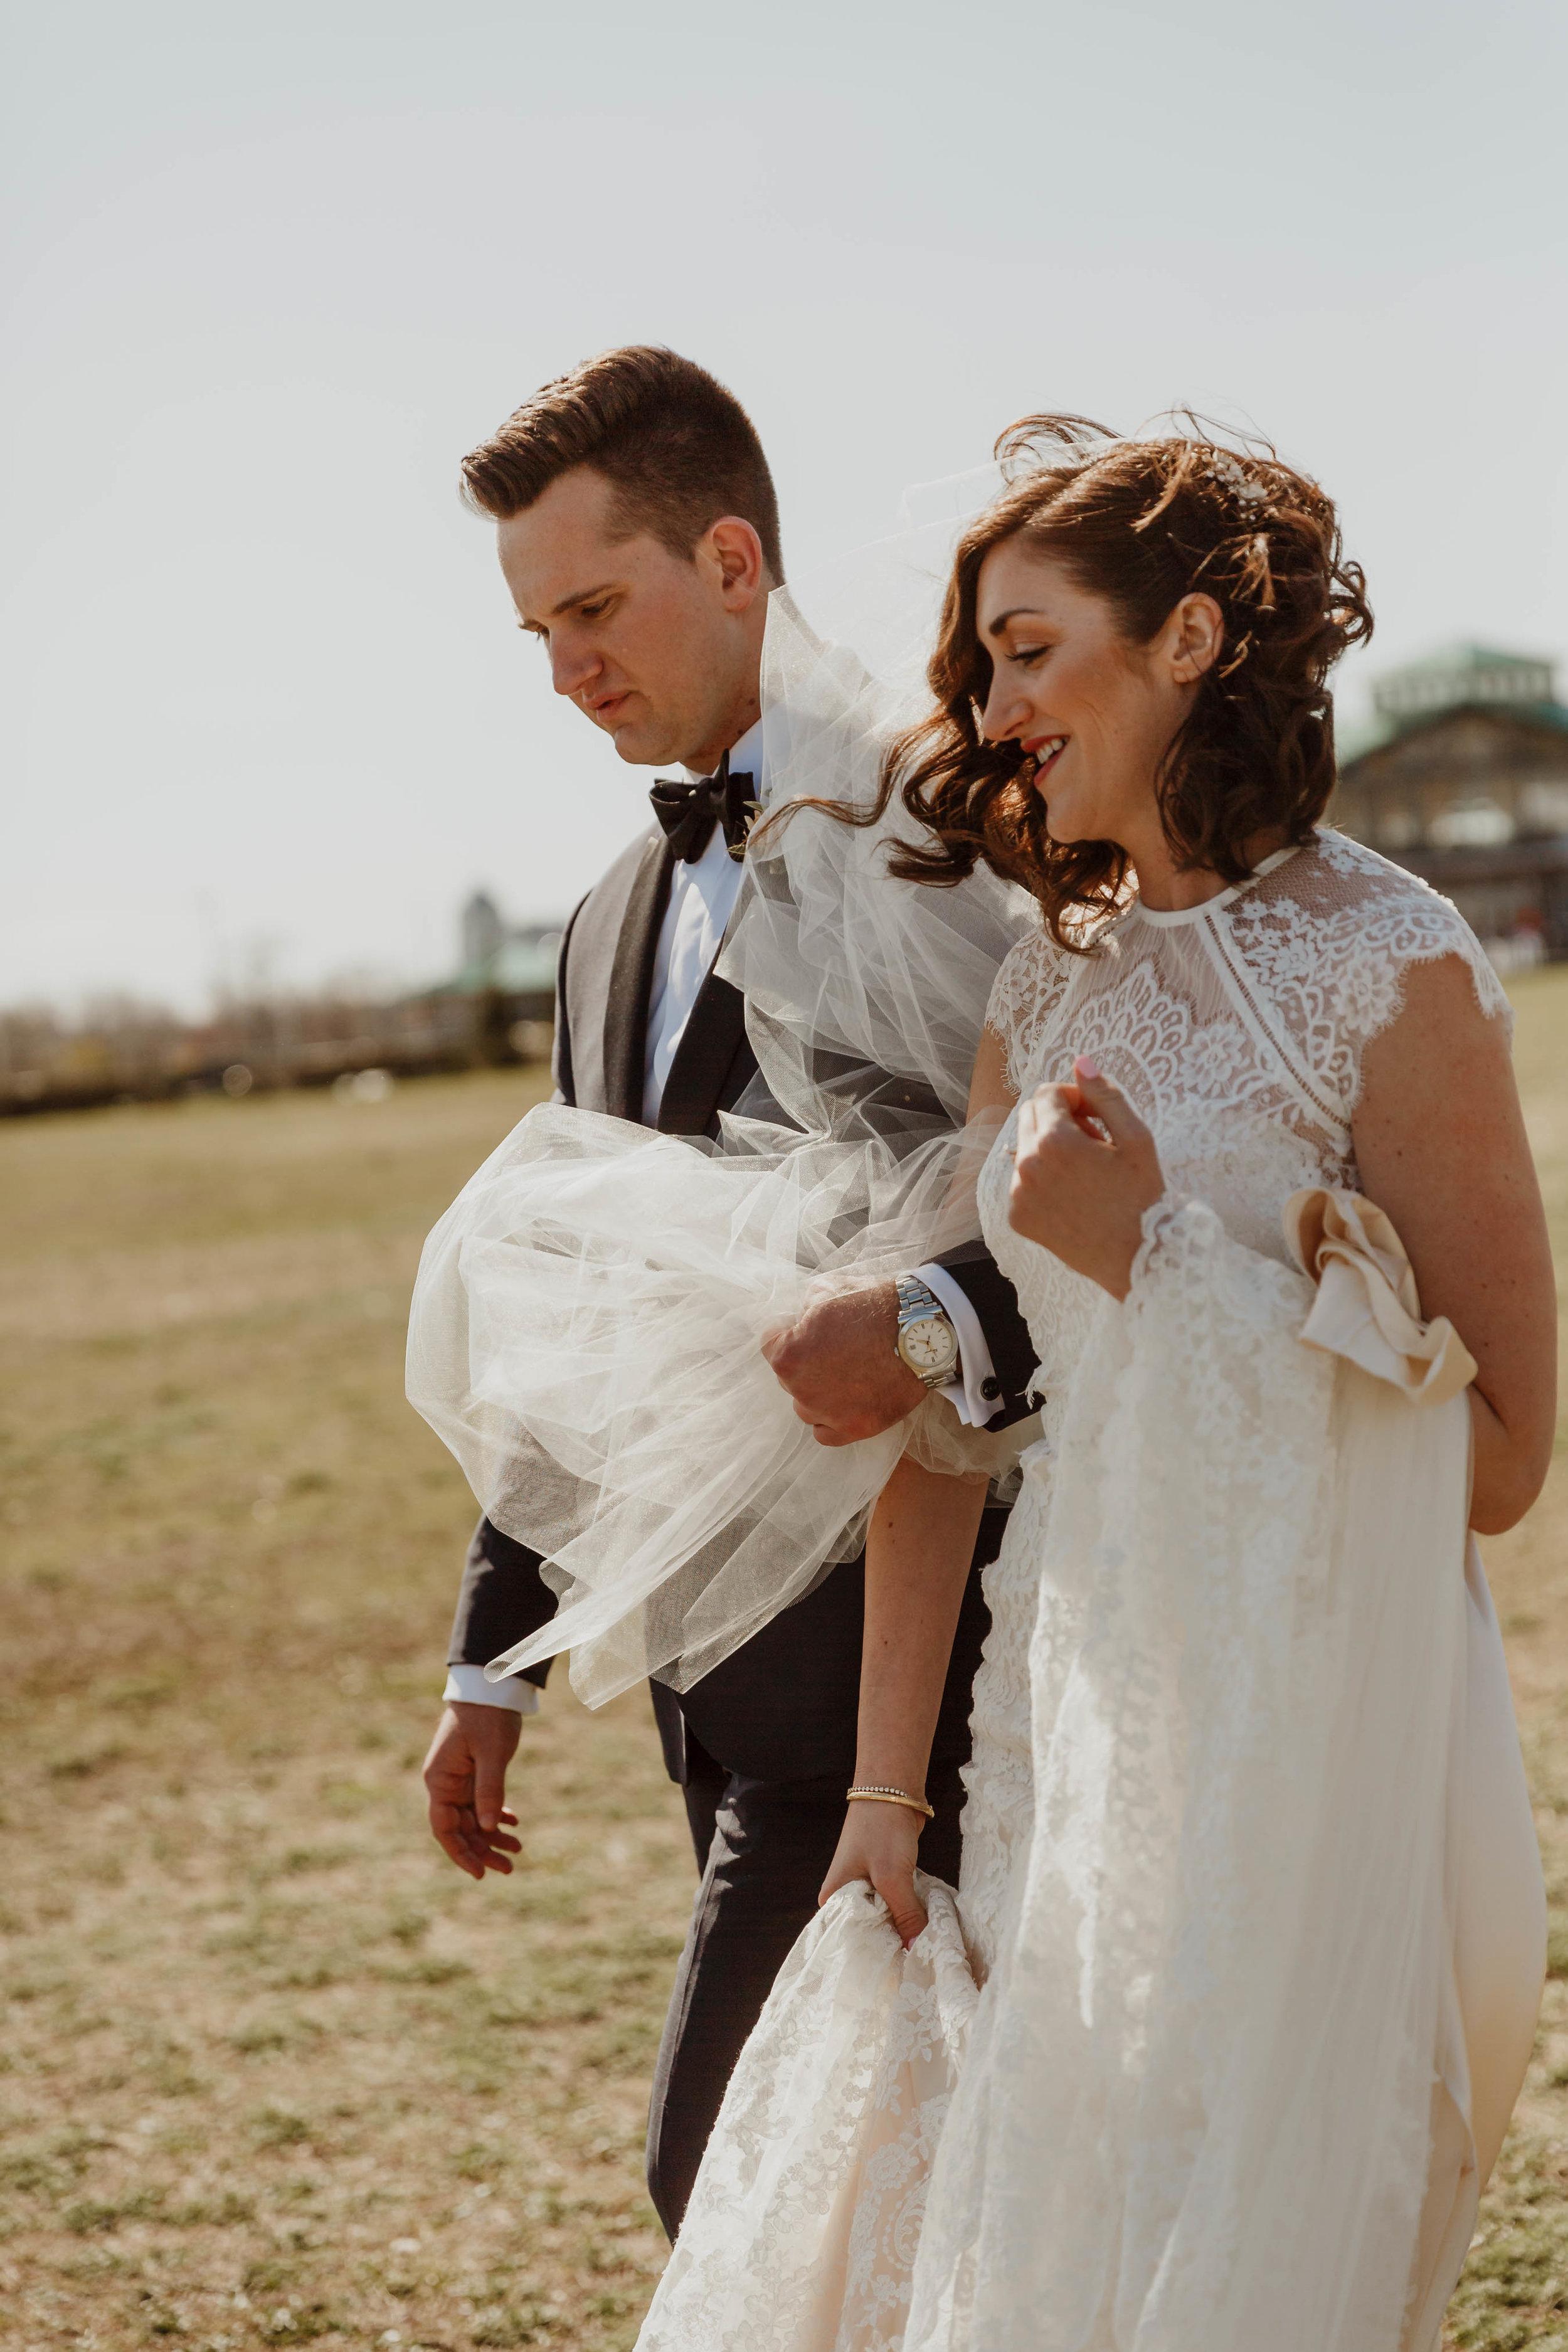 nj-liberty-house-wedding-photographer-elizabeth-tsung-photo